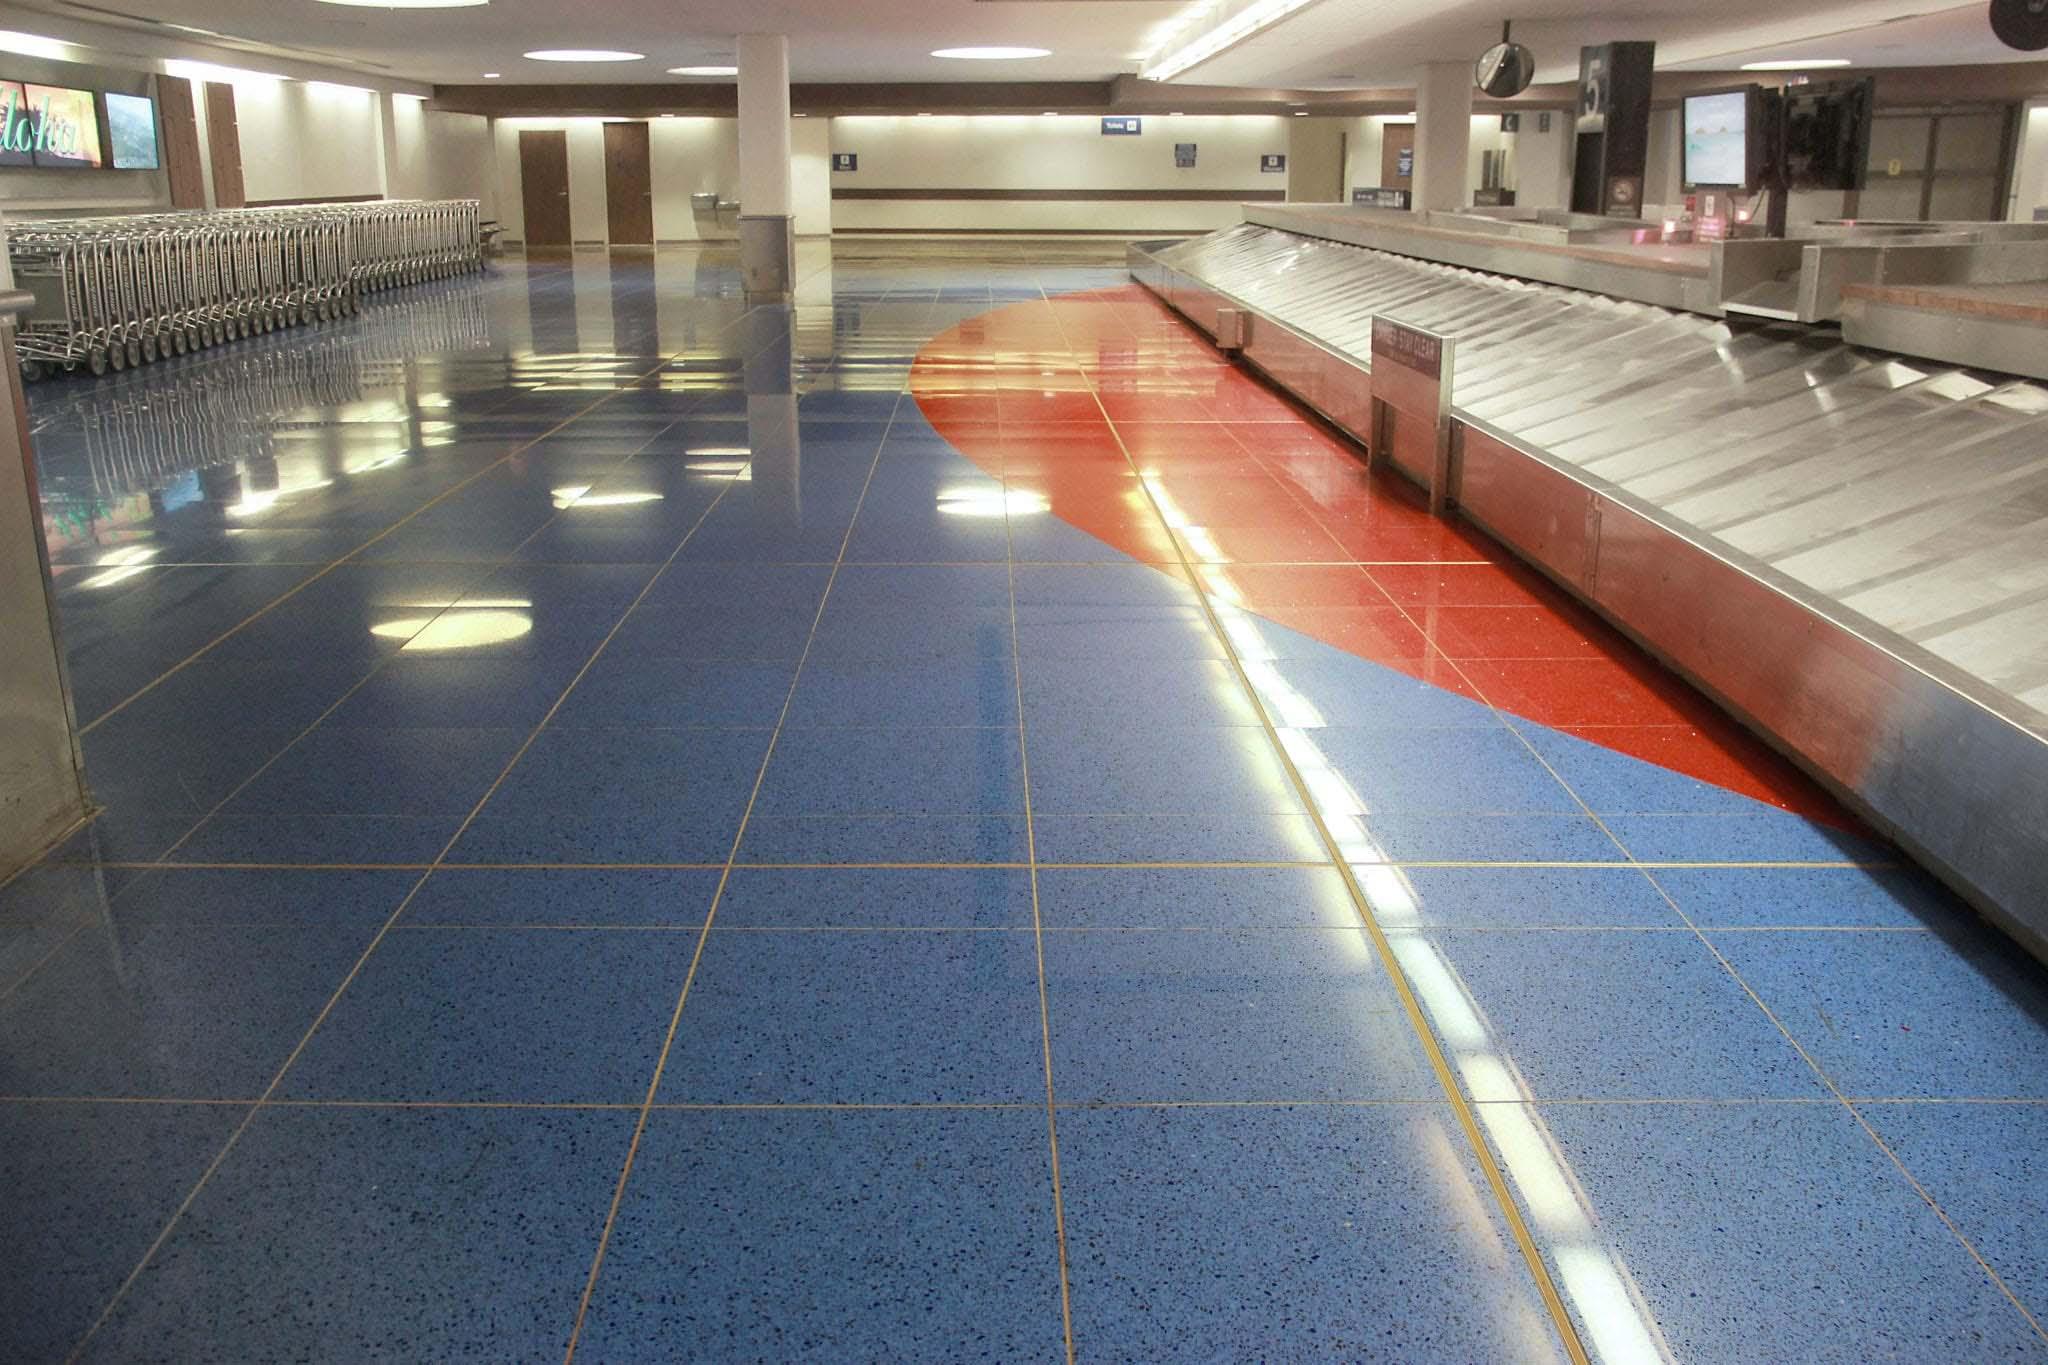 International Arrivals in Honolulu International Airport in Hawaii, USA